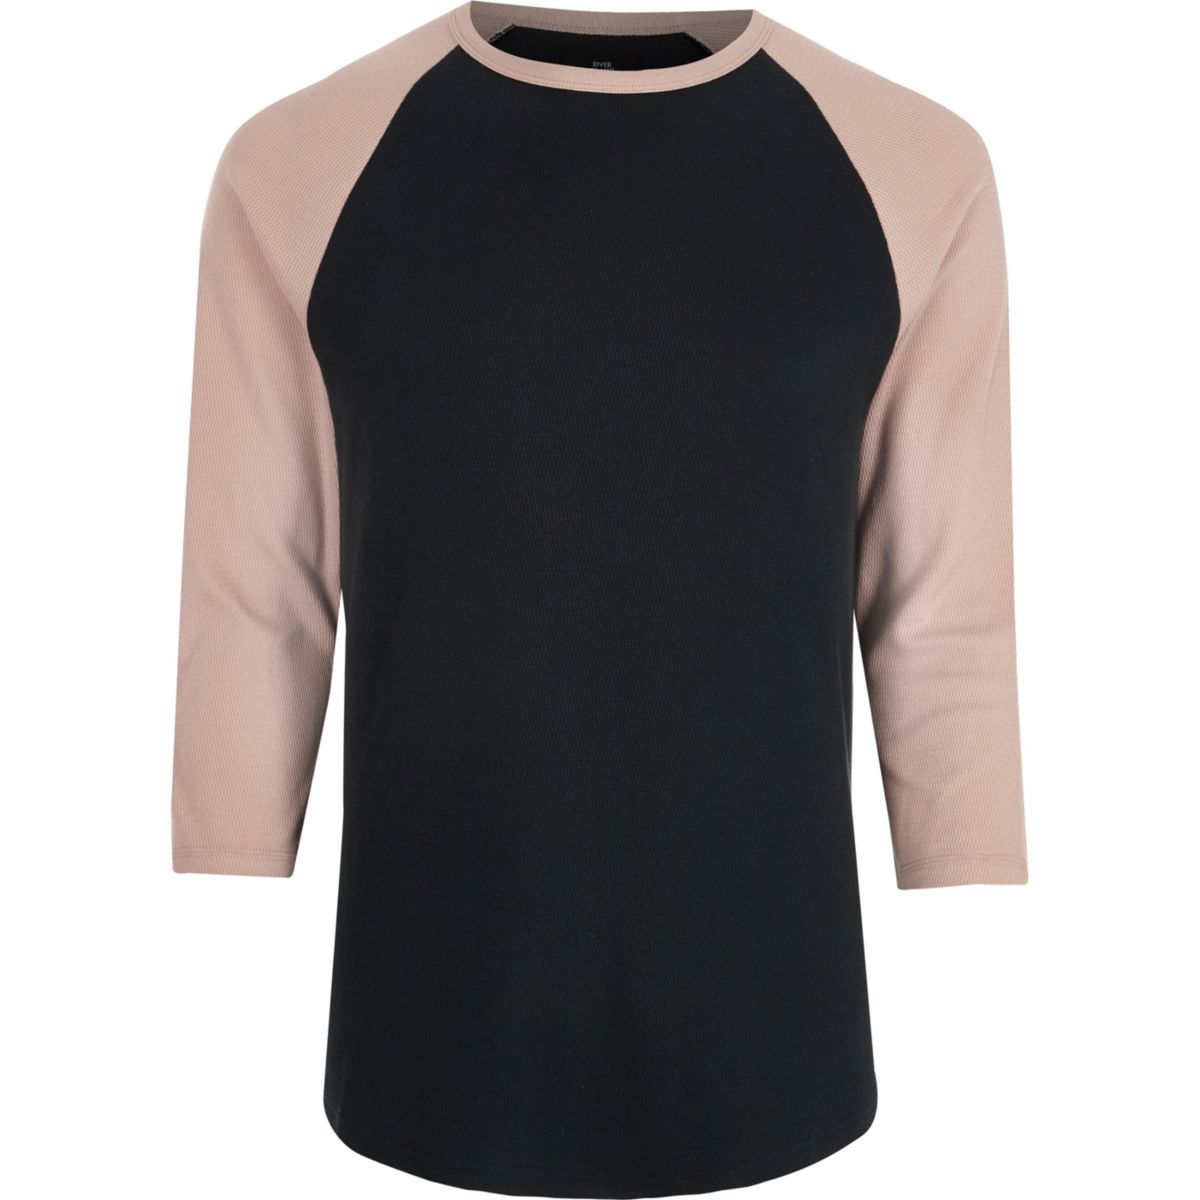 Pink Three Quarter Raglan Sleeve T Shirt by River Island